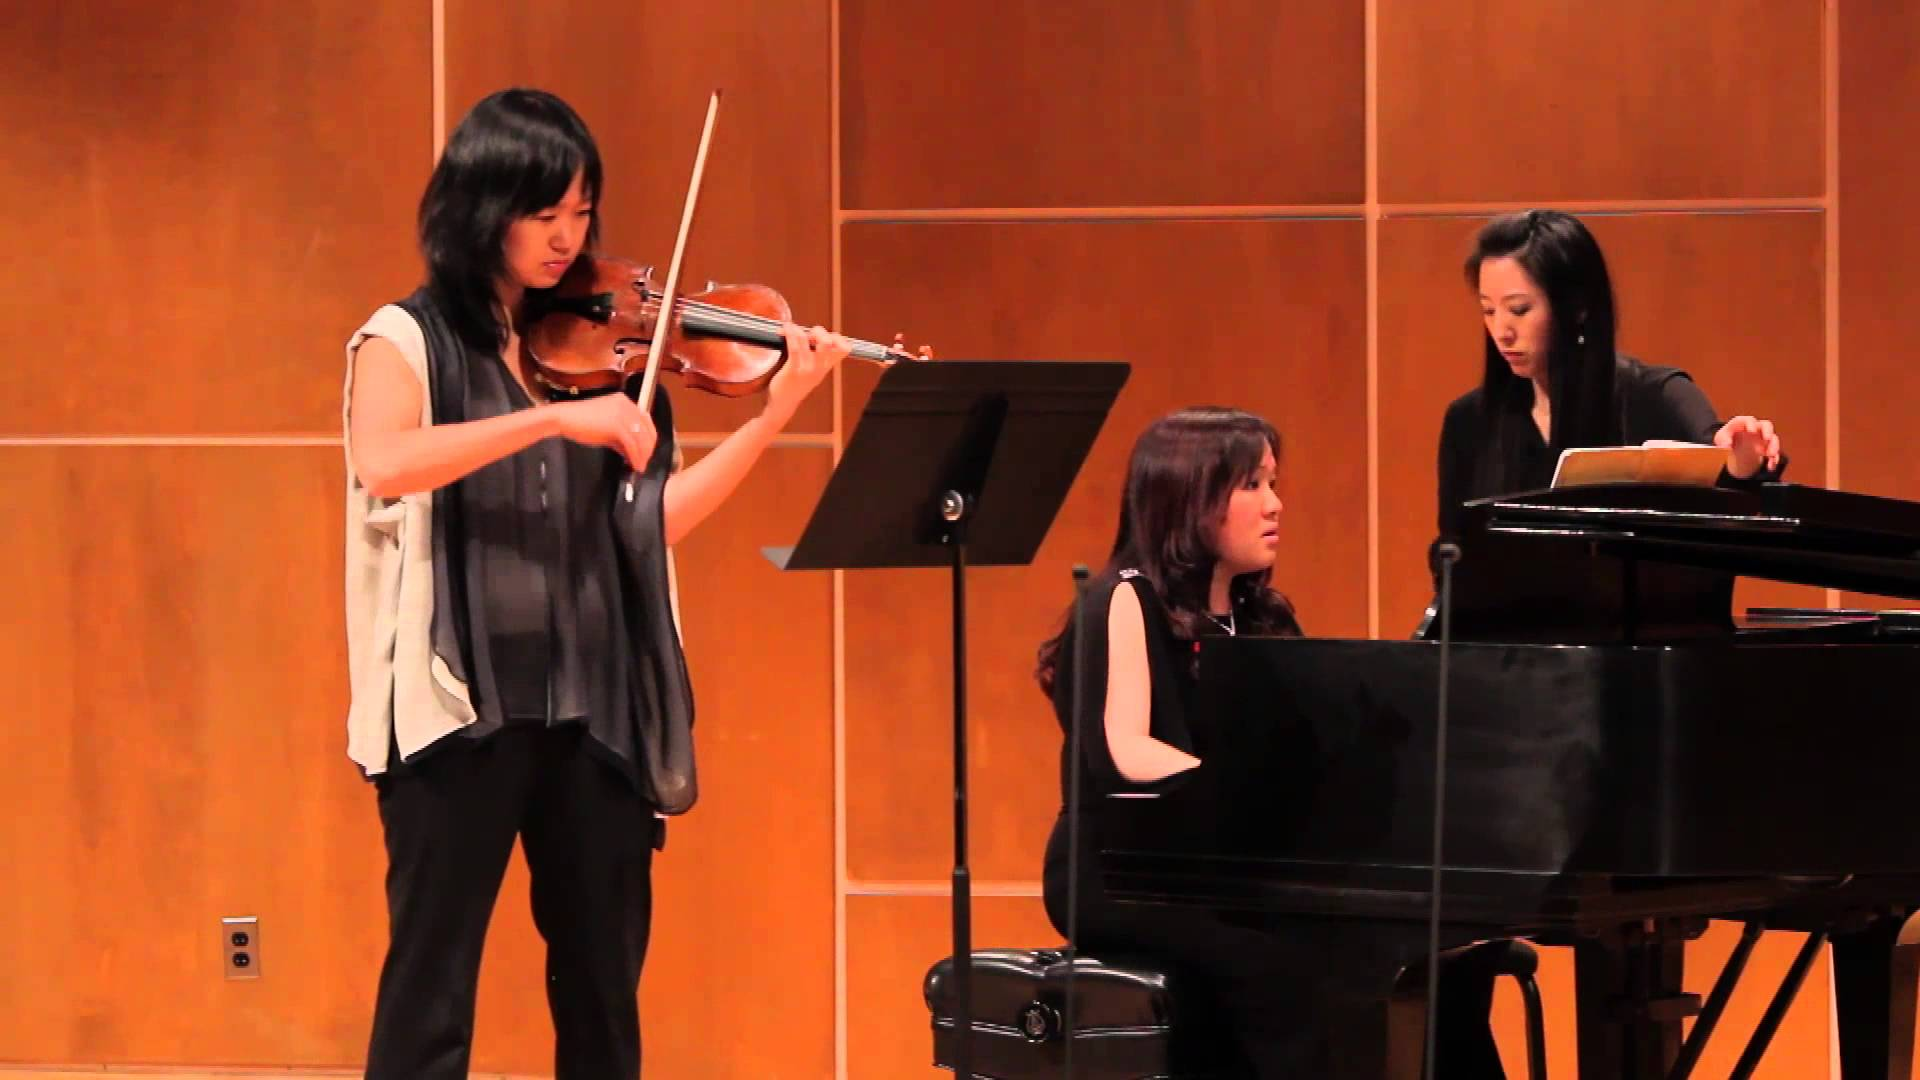 'I am not that violinist Jennifer Kim'